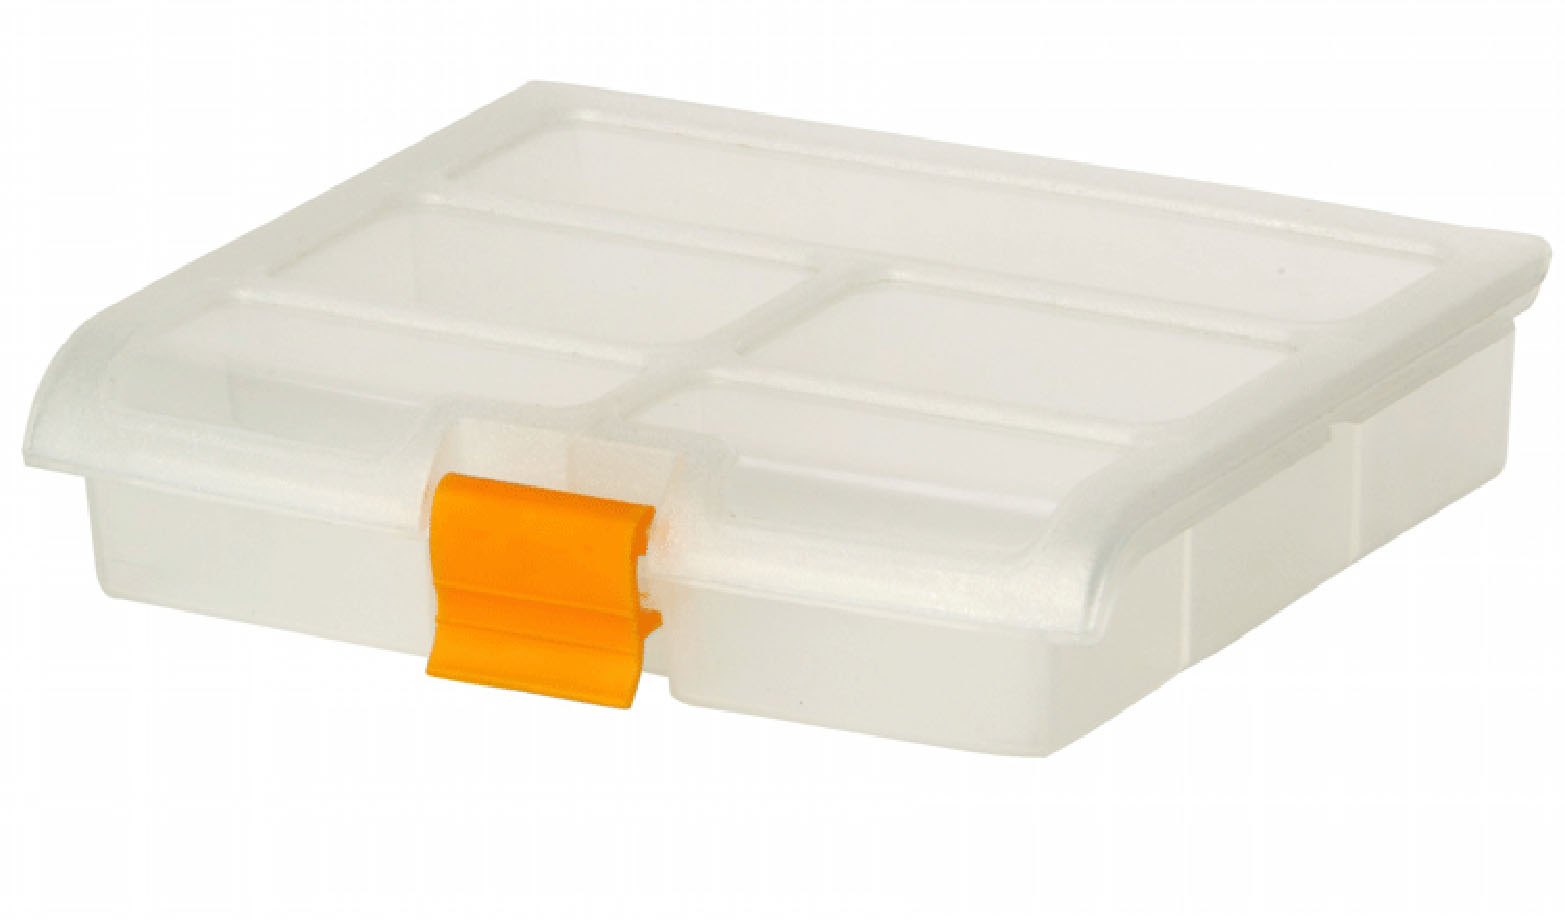 Блок для мелочей Idea, 16,5 см х 13,5 см х 3,5 см канвас idea балкончик 40 х 50 см